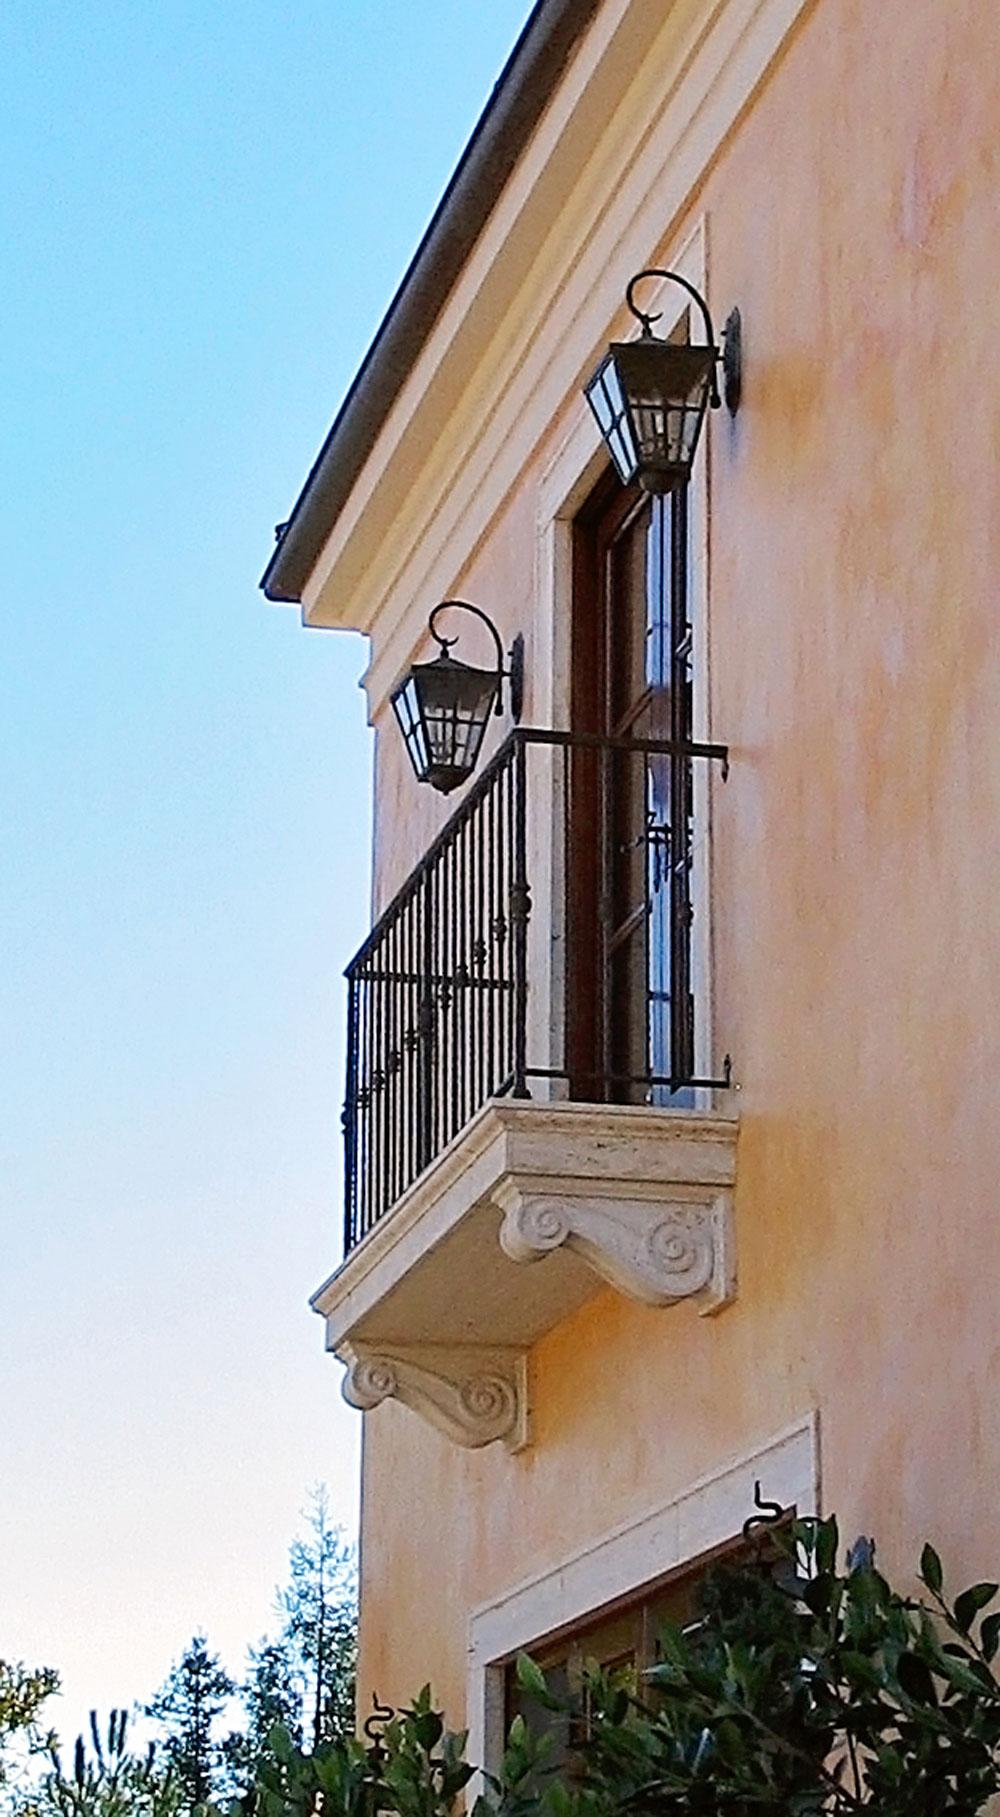 4-window-walk-exterior-dee-carawan.jpg